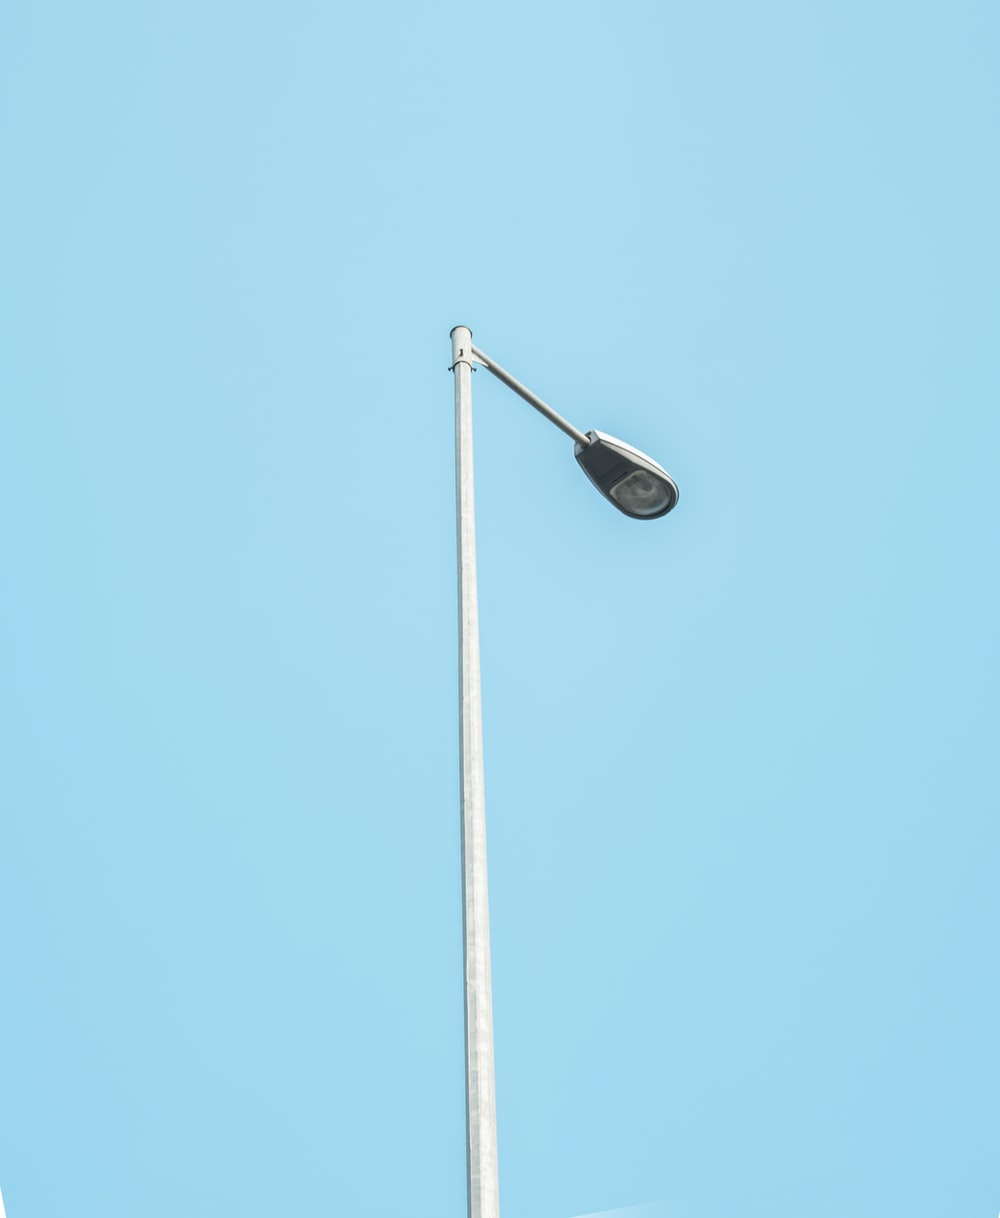 black street light under blue sky during daytime